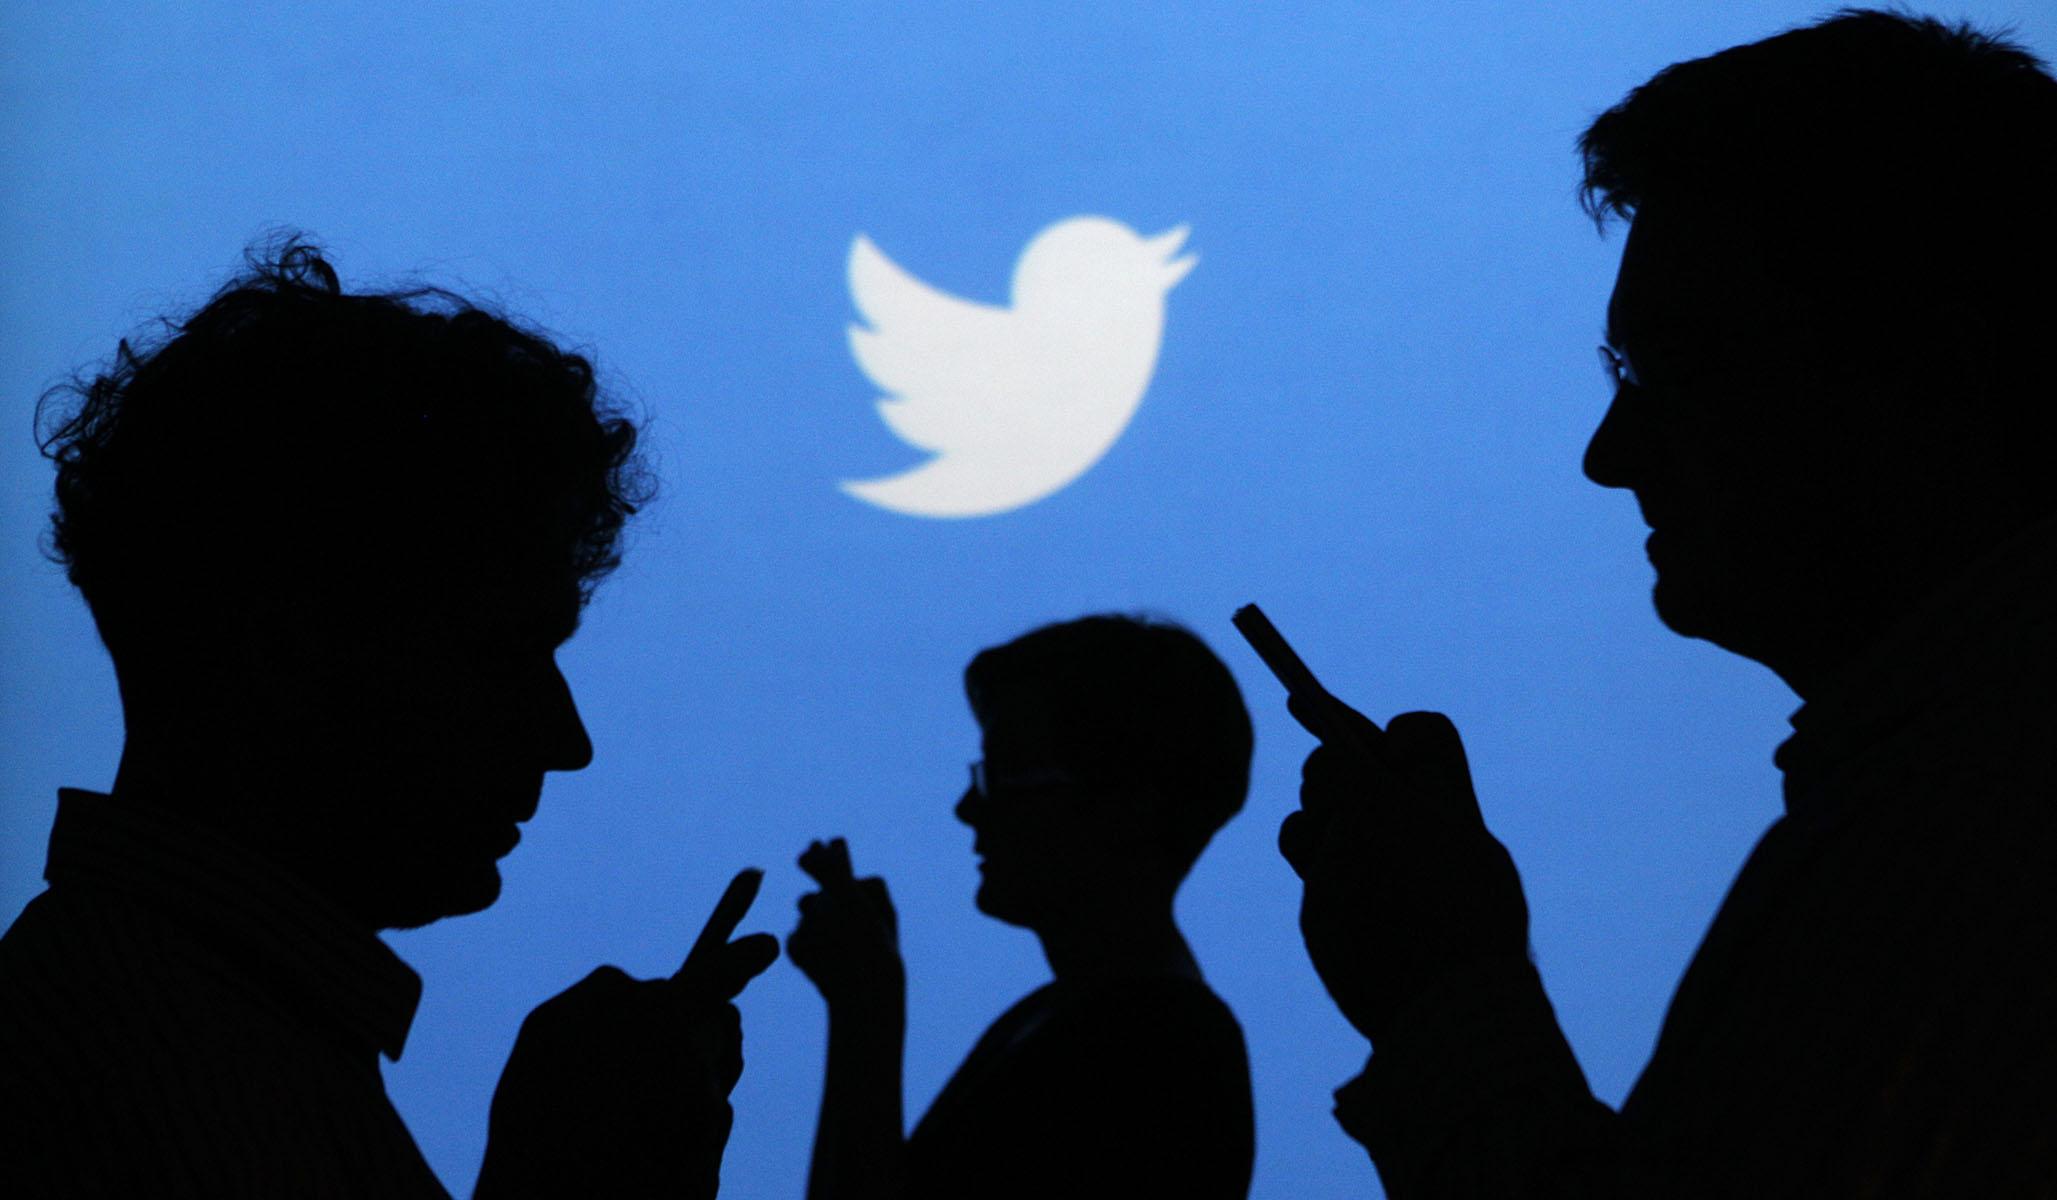 Twitter Mob Attacks Transgender YouTube Star